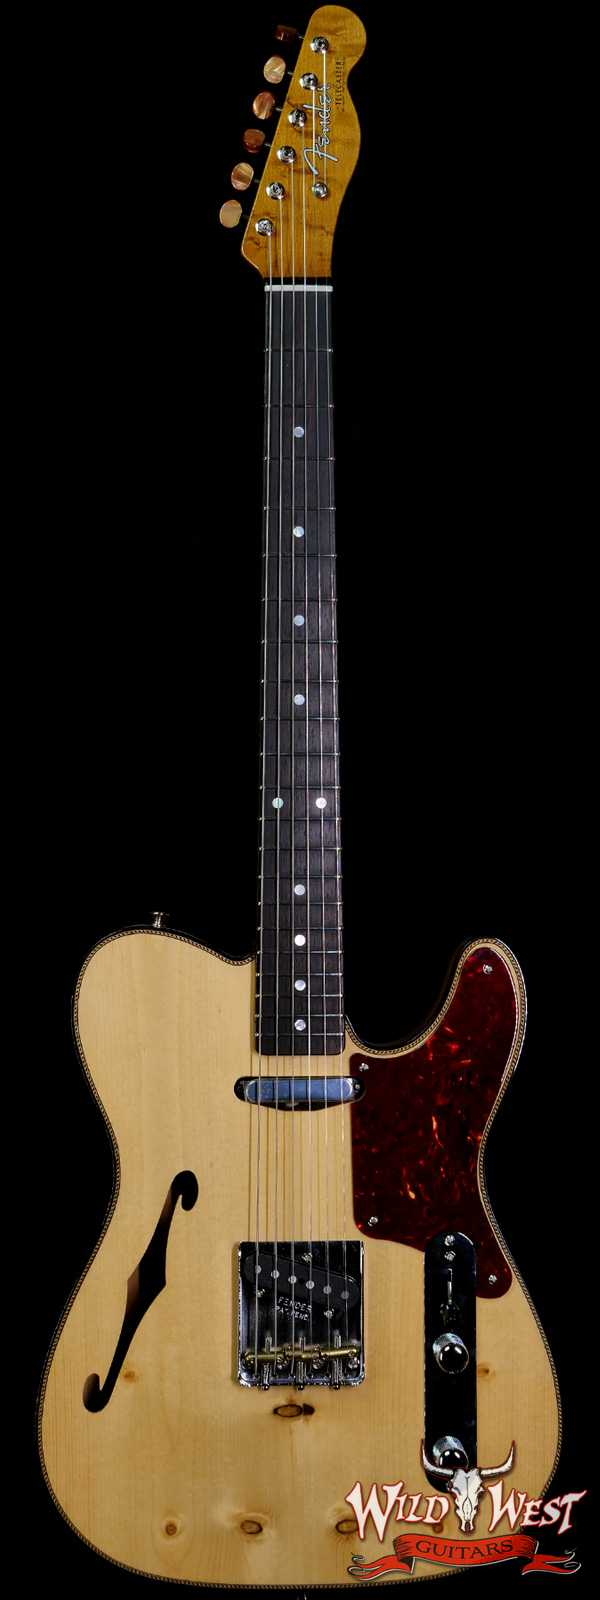 Fender Custom Shop Ltd Knotty Pine Telecaster Thinline Hand-Wound Pickups Aged Natural